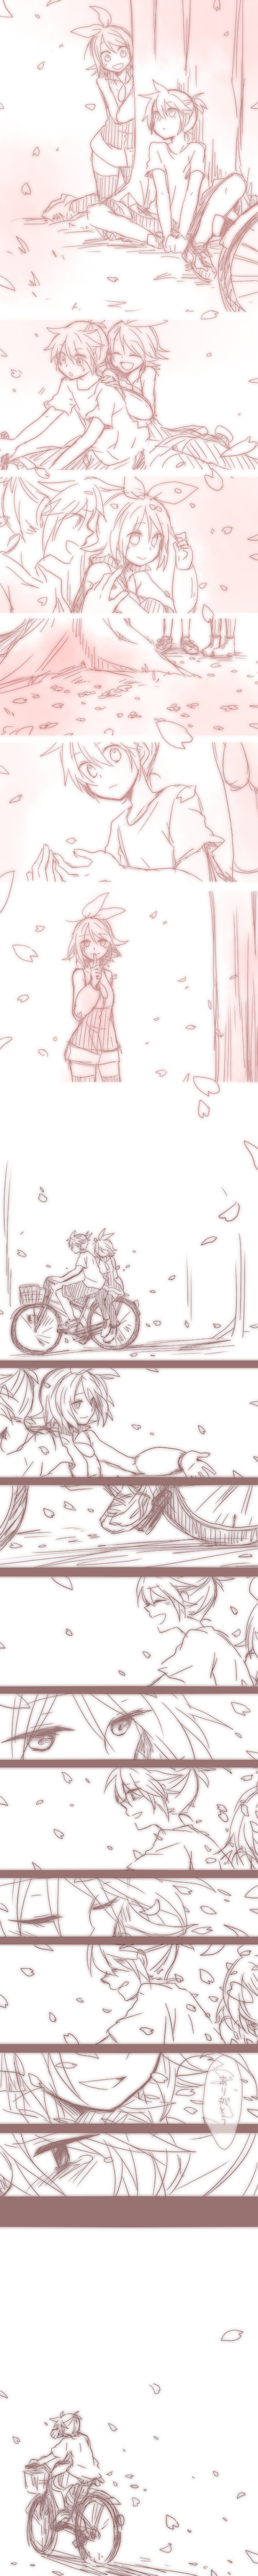 Tags: Anime, Ryou (Pixiv247657), VOCALOID, Kagamine Len, Kagamine Rin, Sad Comic, Text: Thank You, Hand Over One Eye, Sakura Fiction, Comic, Kagamine Mirrors